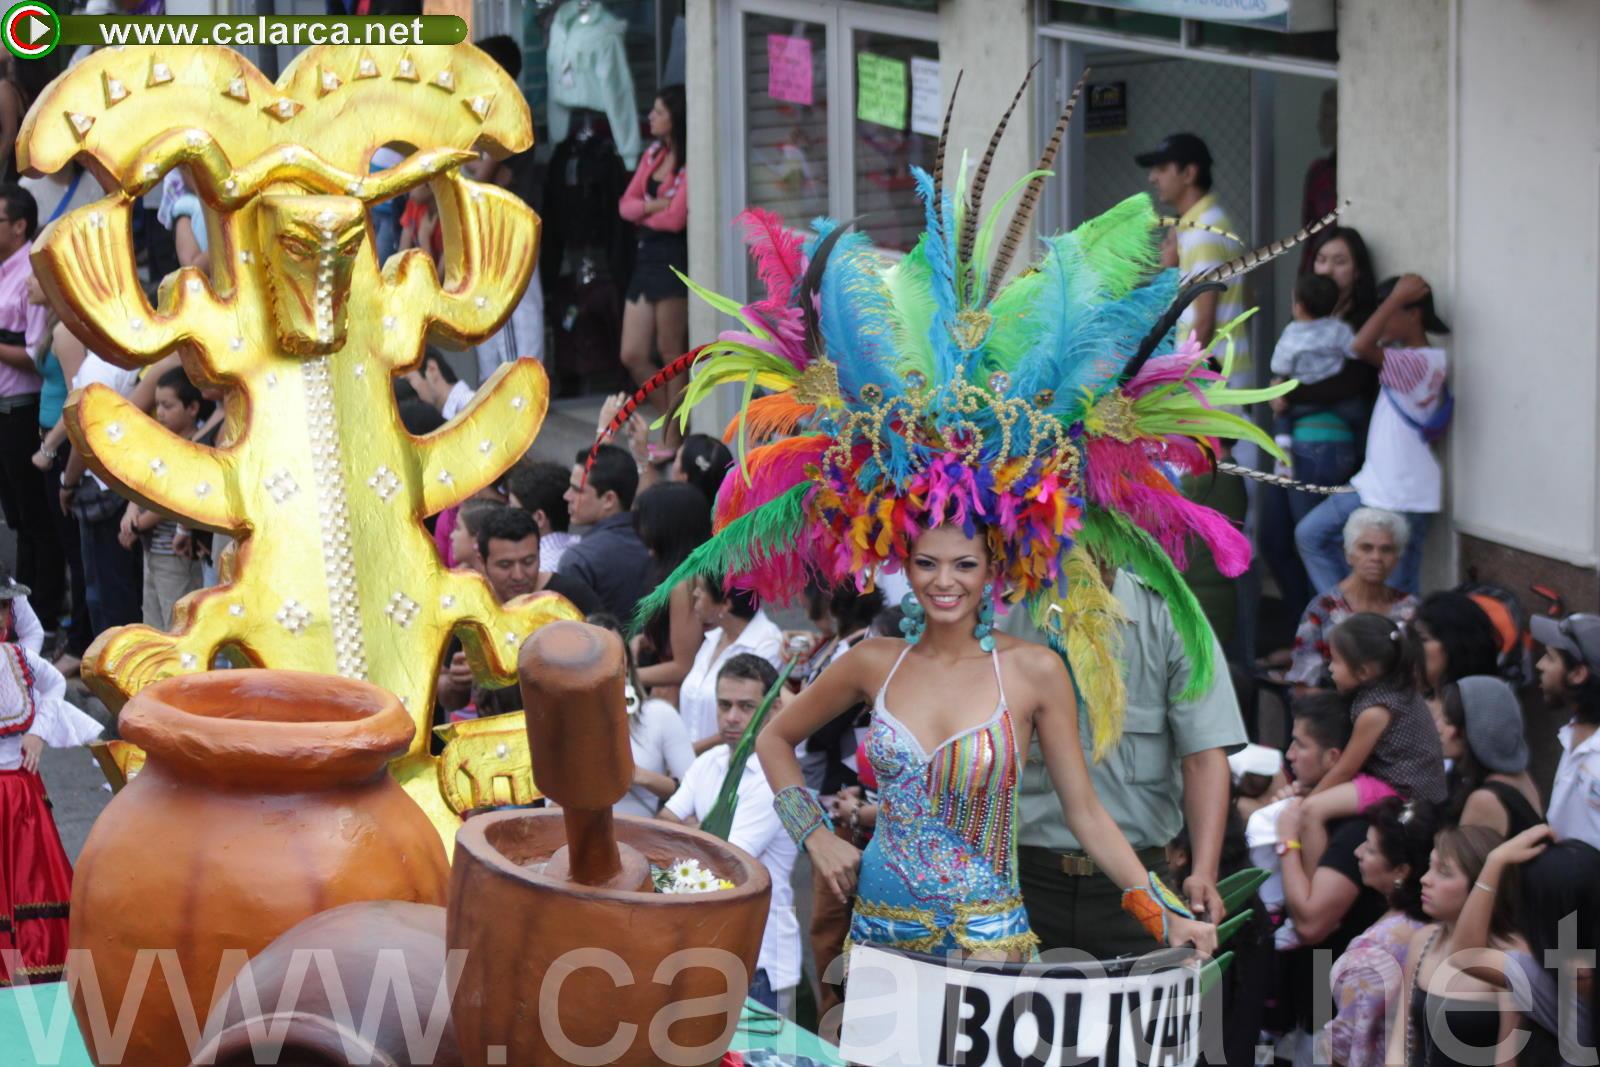 Bolívar - Olga Catalina Salas Atencia